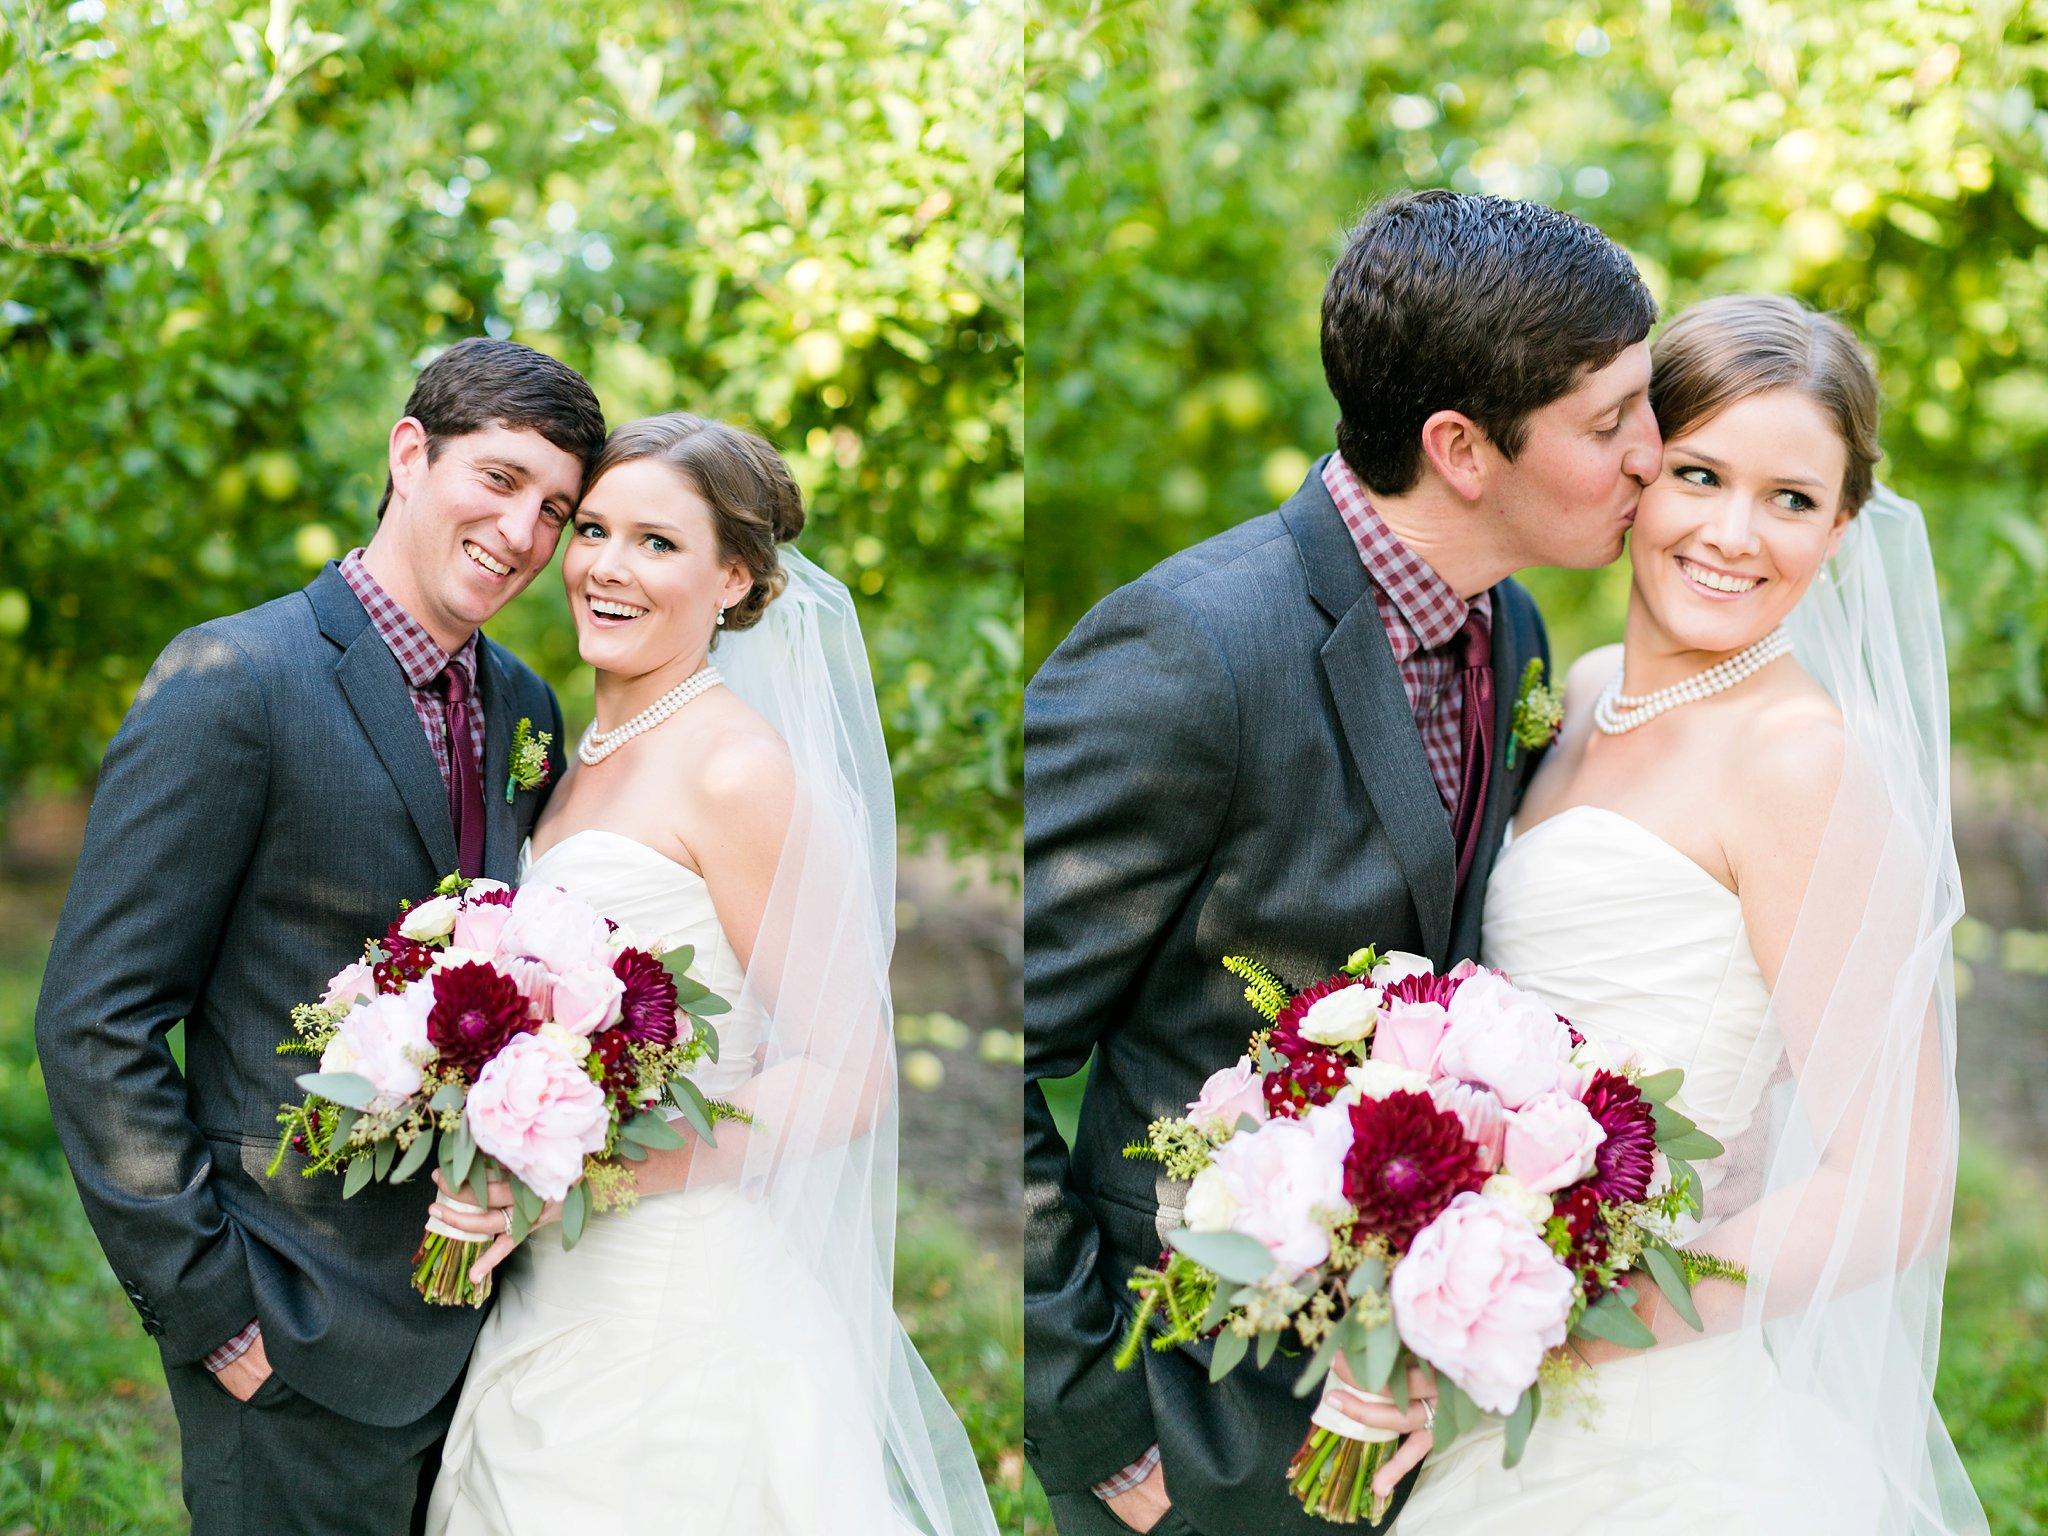 Chelan Washington Wedding Photos Megan Kelsey Photography Delight Wedding Workshop Styled Shoot Annalee & Scot-79.jpg